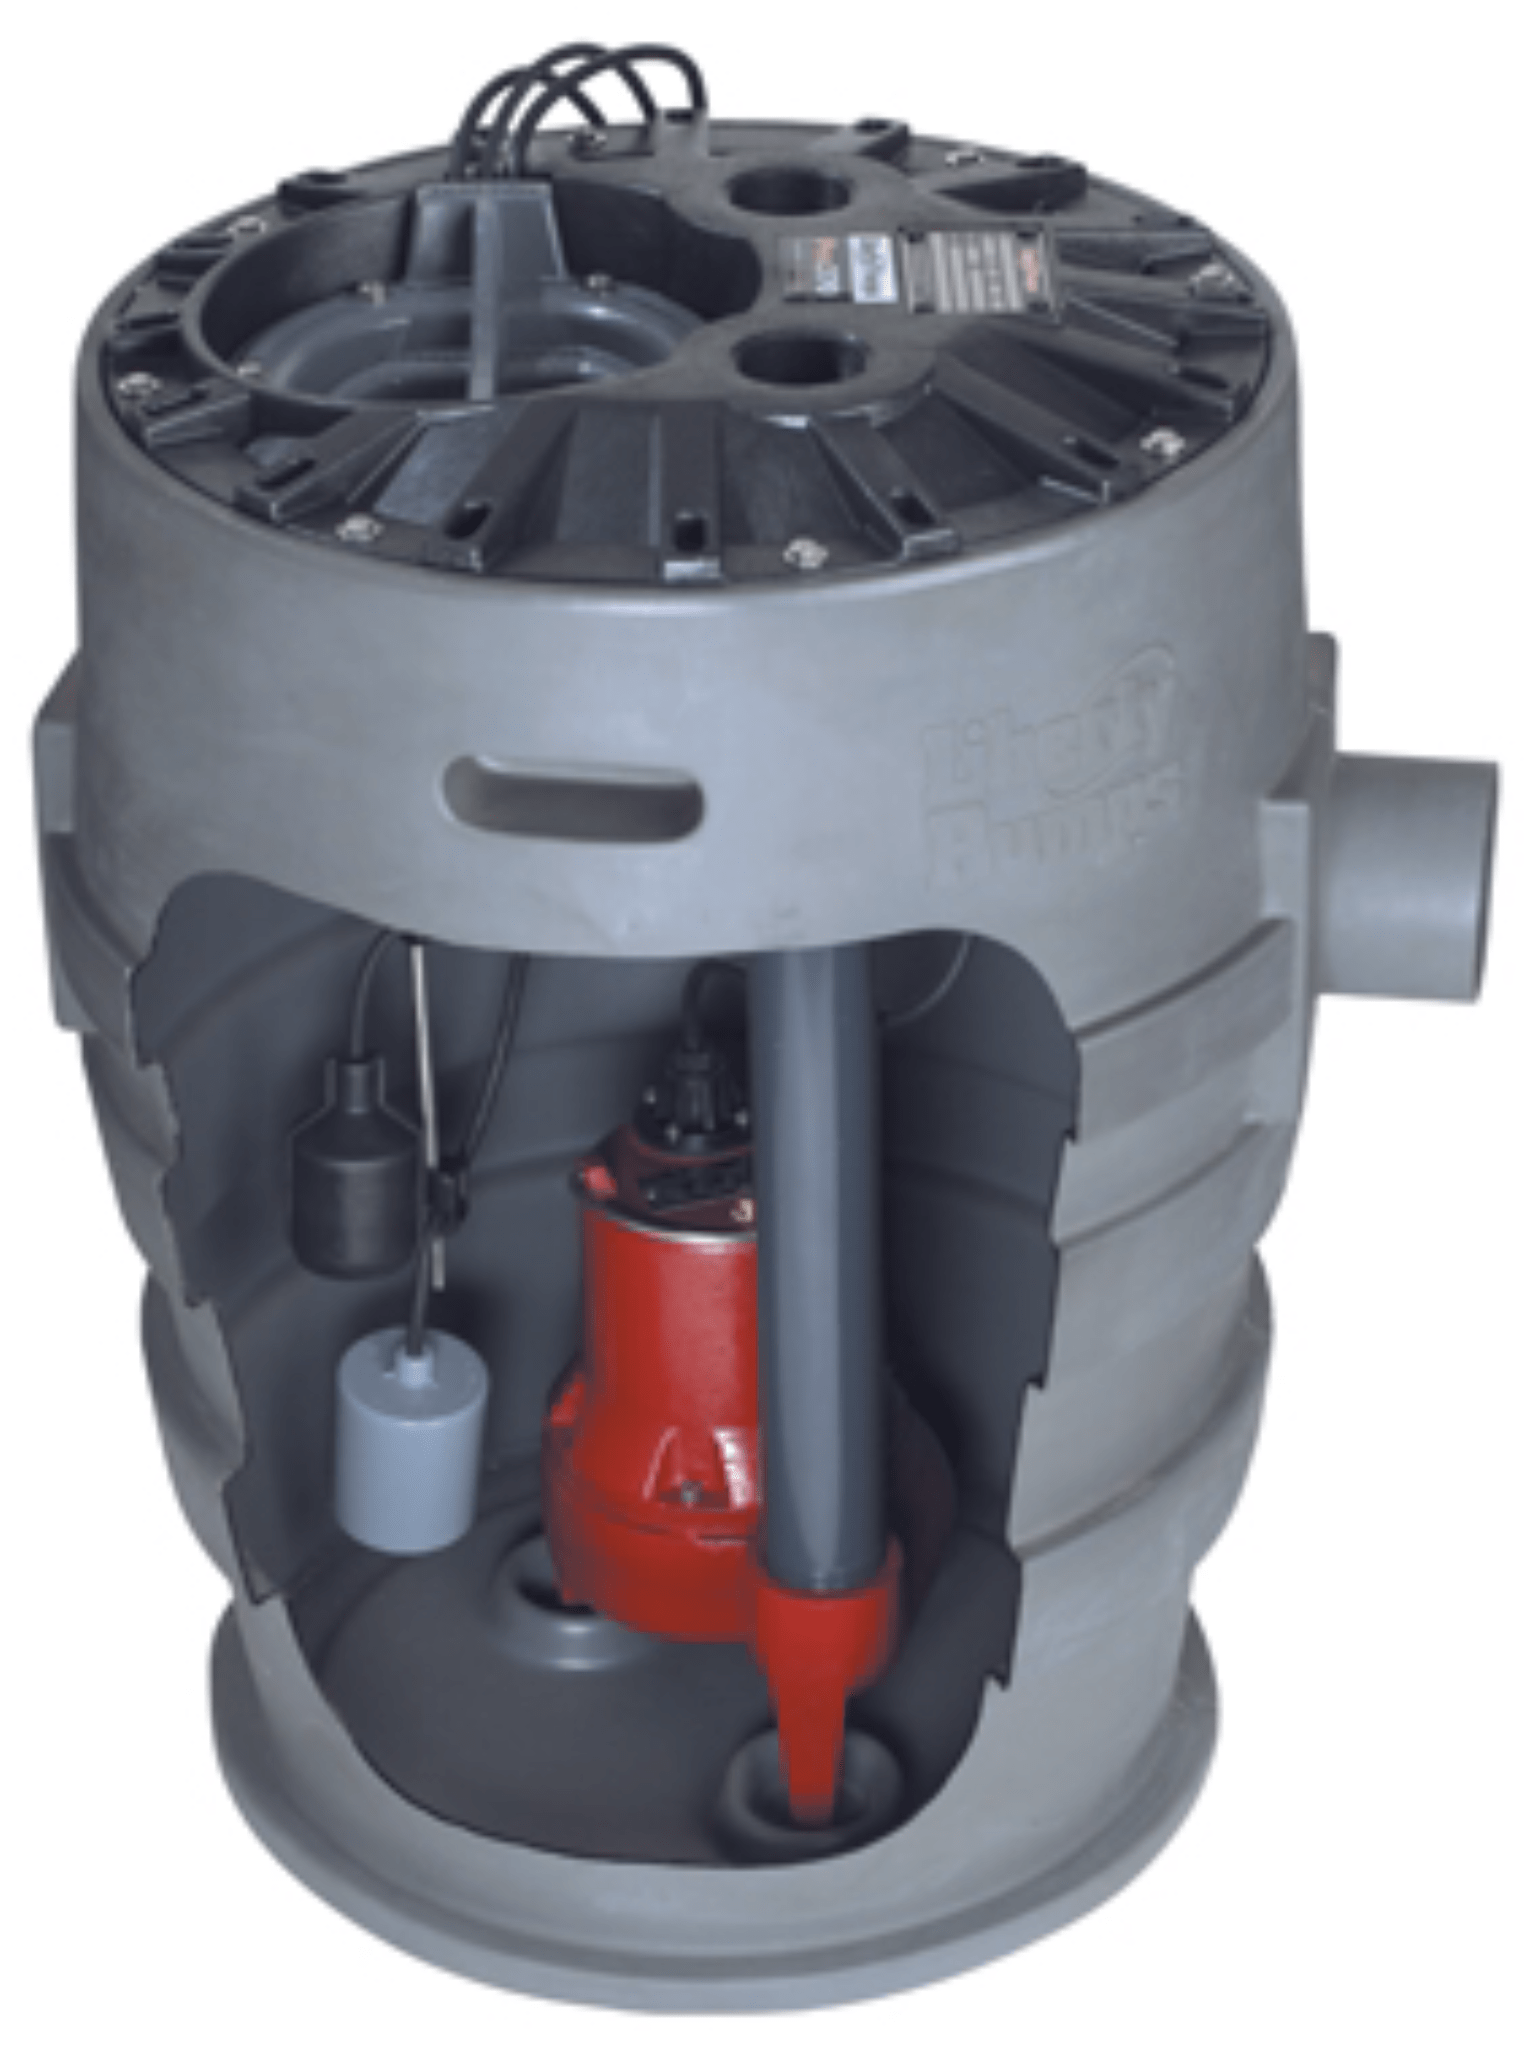 Ejector sewage pit